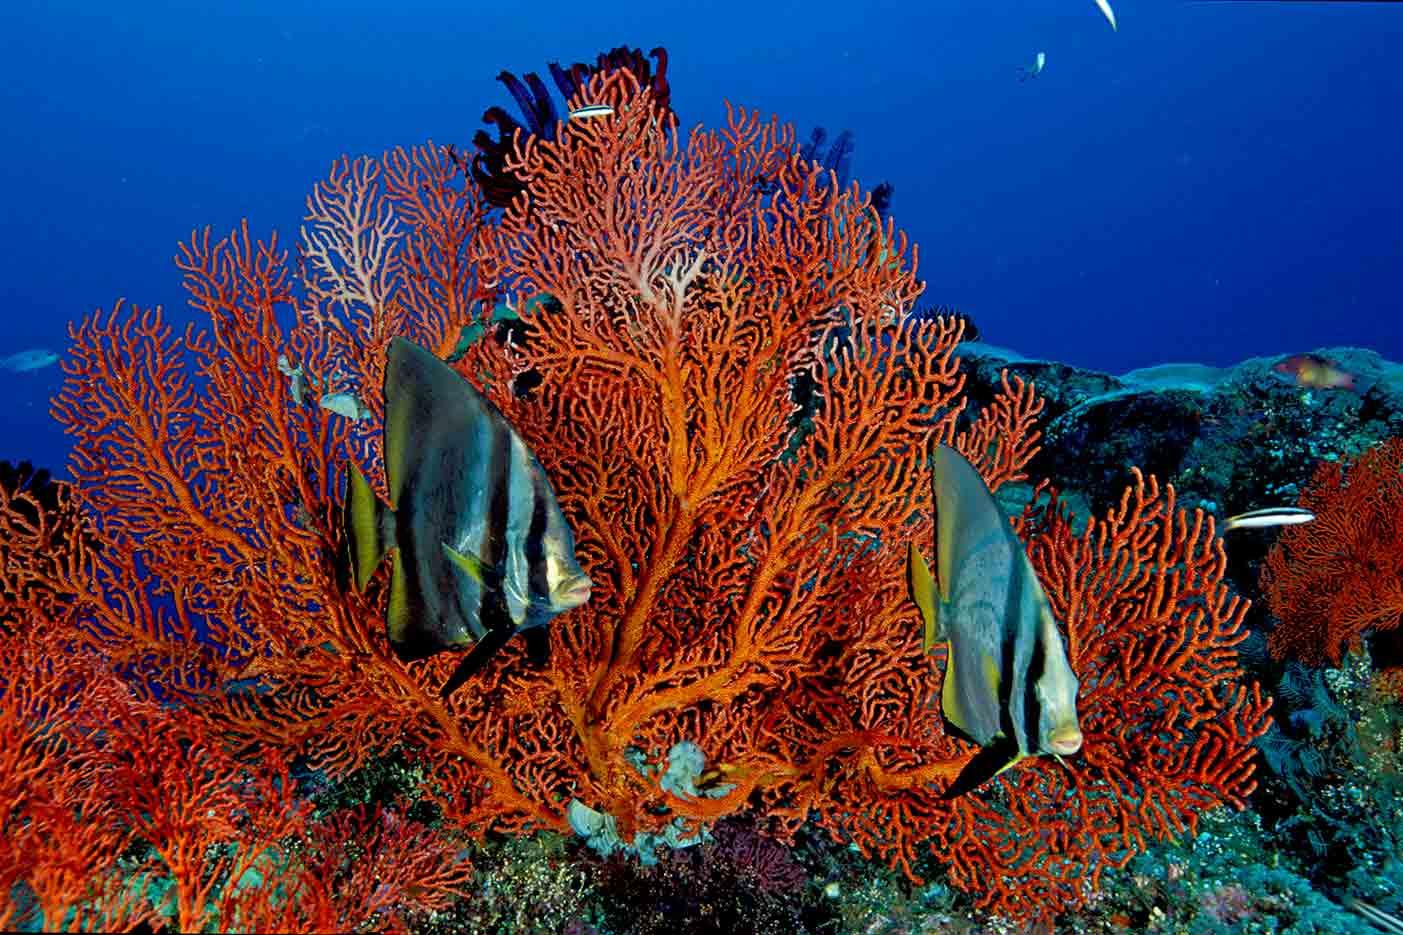 Gili-Trawangan-Lombok-Activities-Activity-Scuba-Scubadive-Scubadiving-Dive-Diving-84.jpg